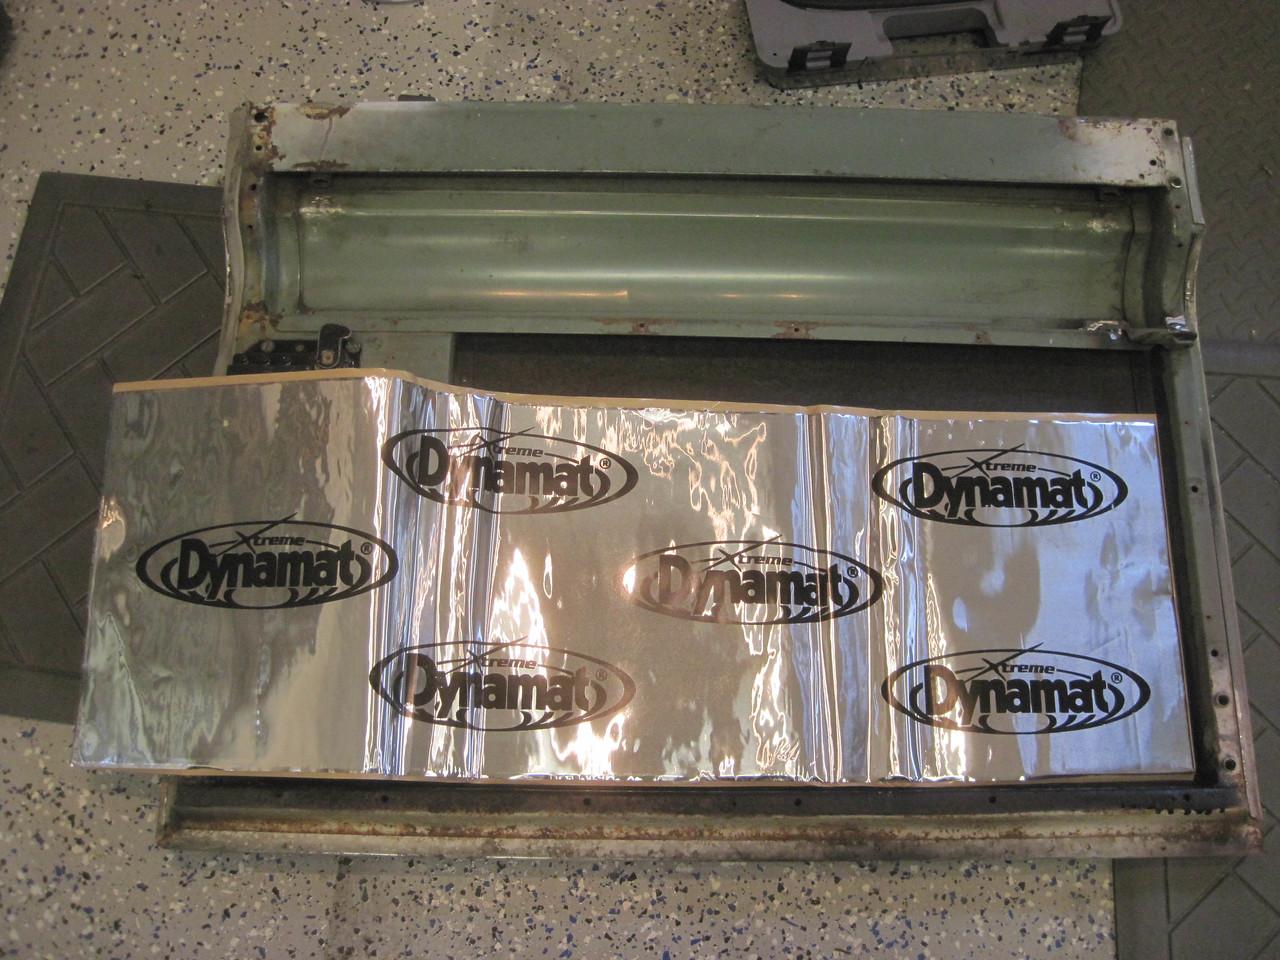 Putting Dynamat in the rear door.